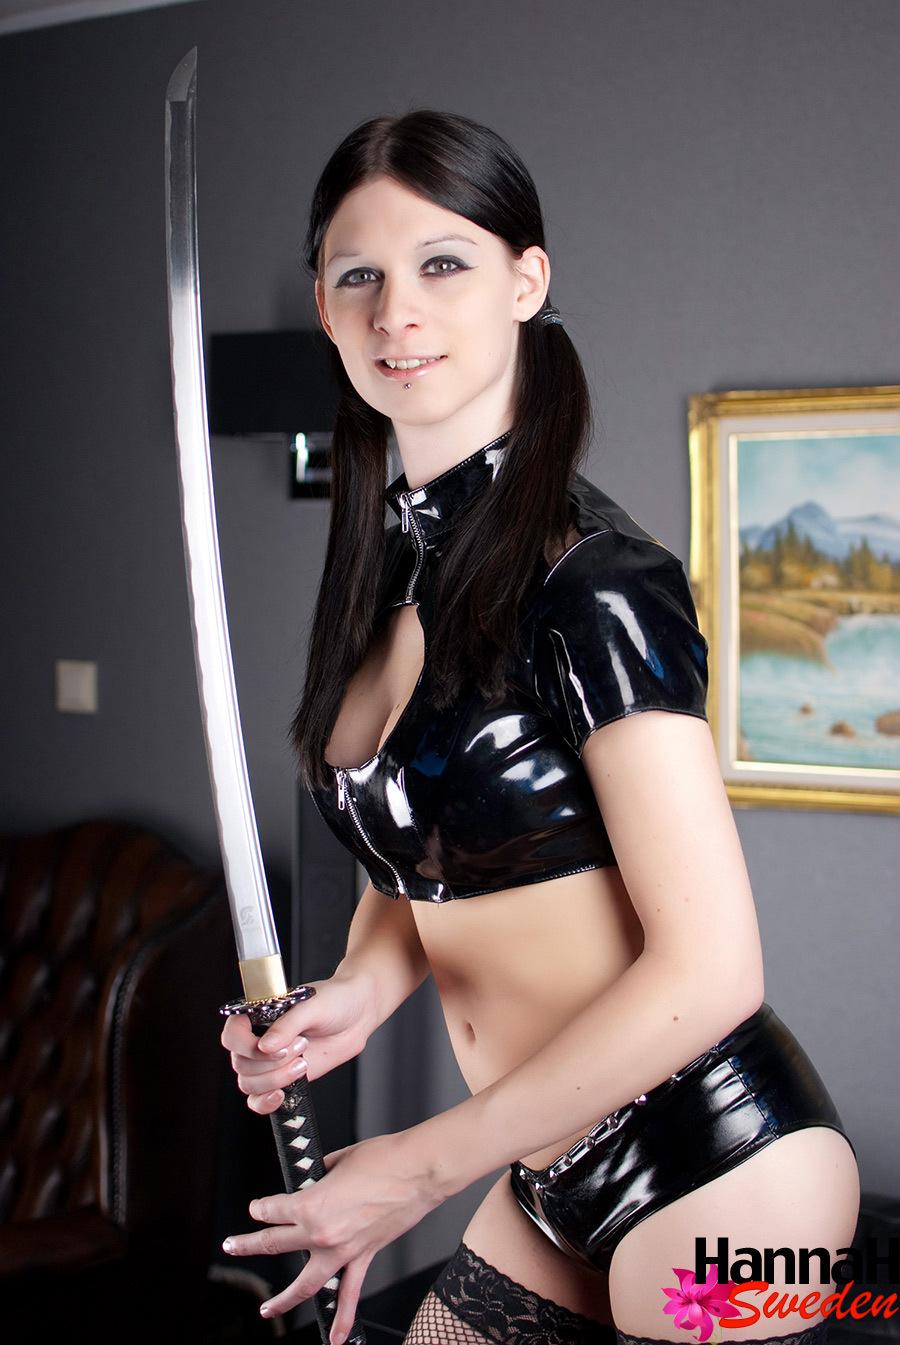 Kinky Tgirl Armed With A Long Dangerous Katana